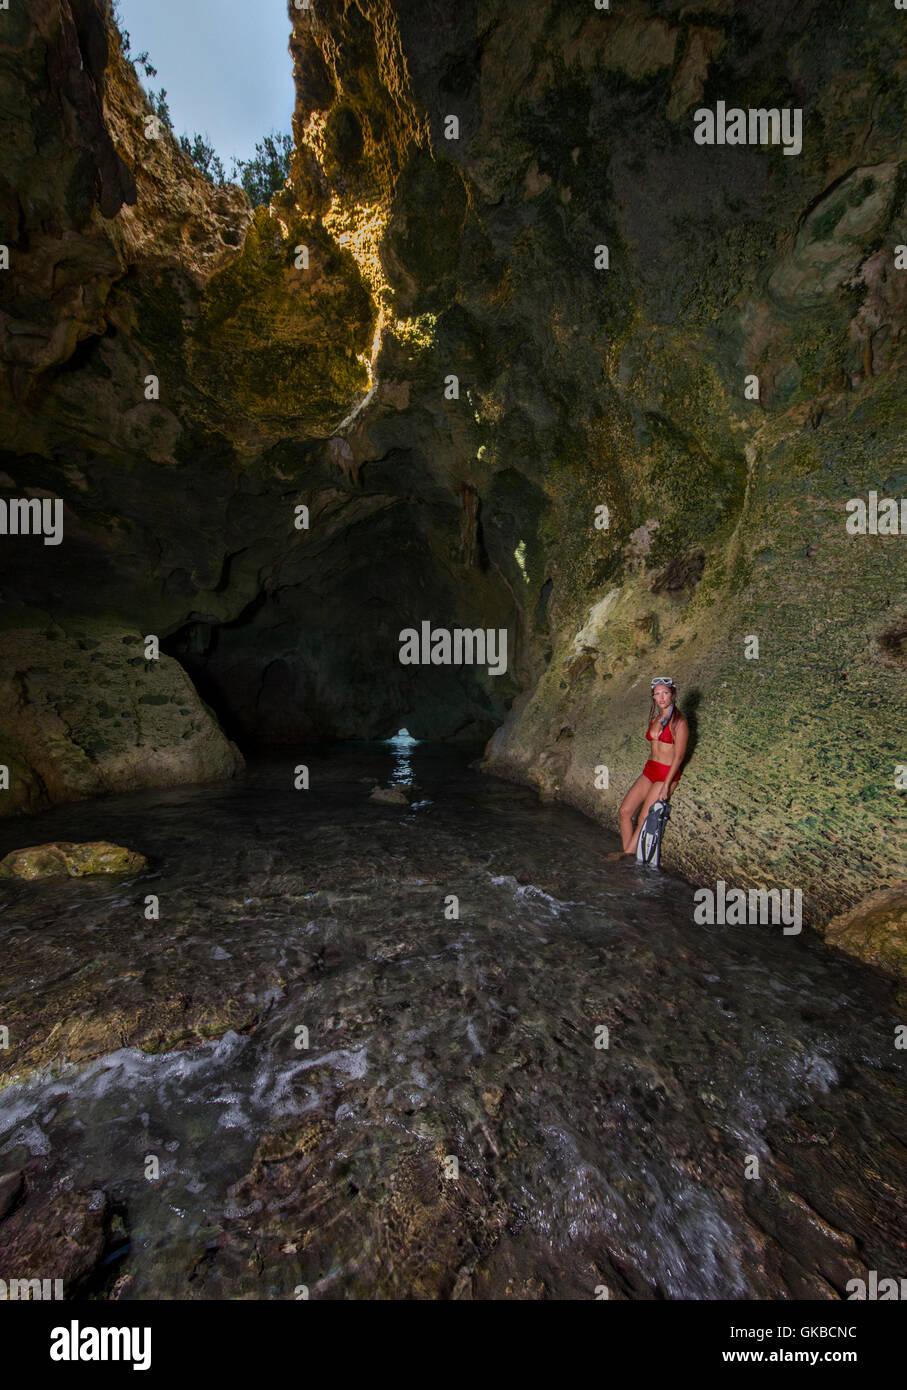 Young woman in a red bikini in a grotto, Rocky Dundas Cay, Exuma Cays, Bahamas Islands - Stock Image